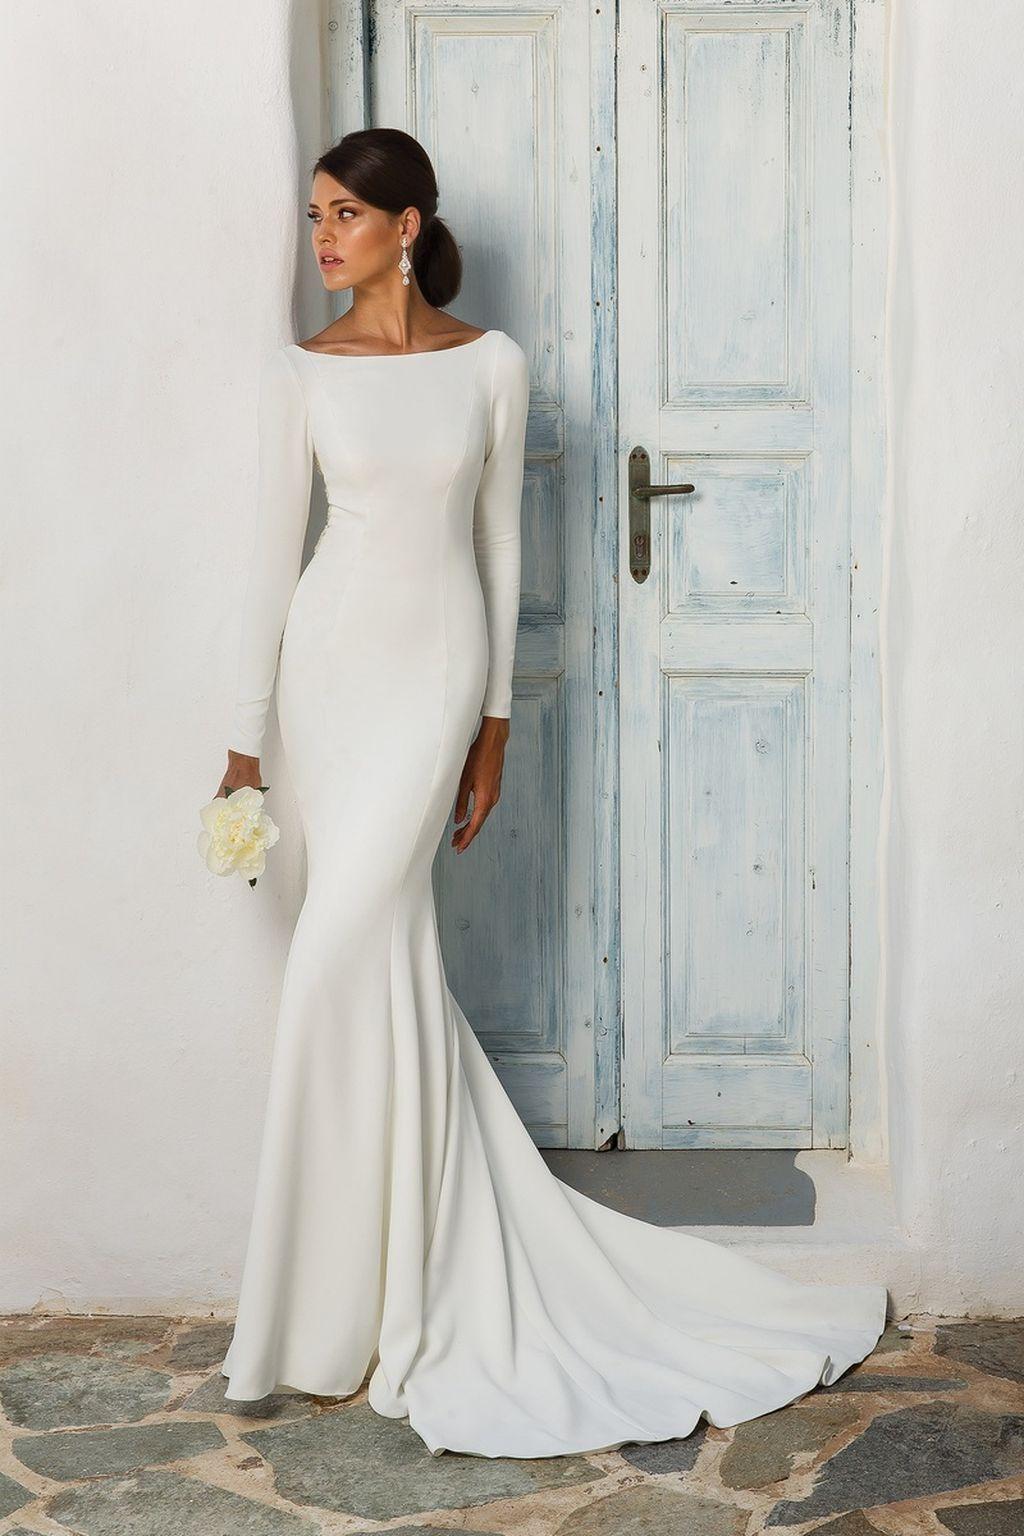 Fleur wedding dress  Pin by Fleur on Some day  Pinterest  Dress ideas Winter